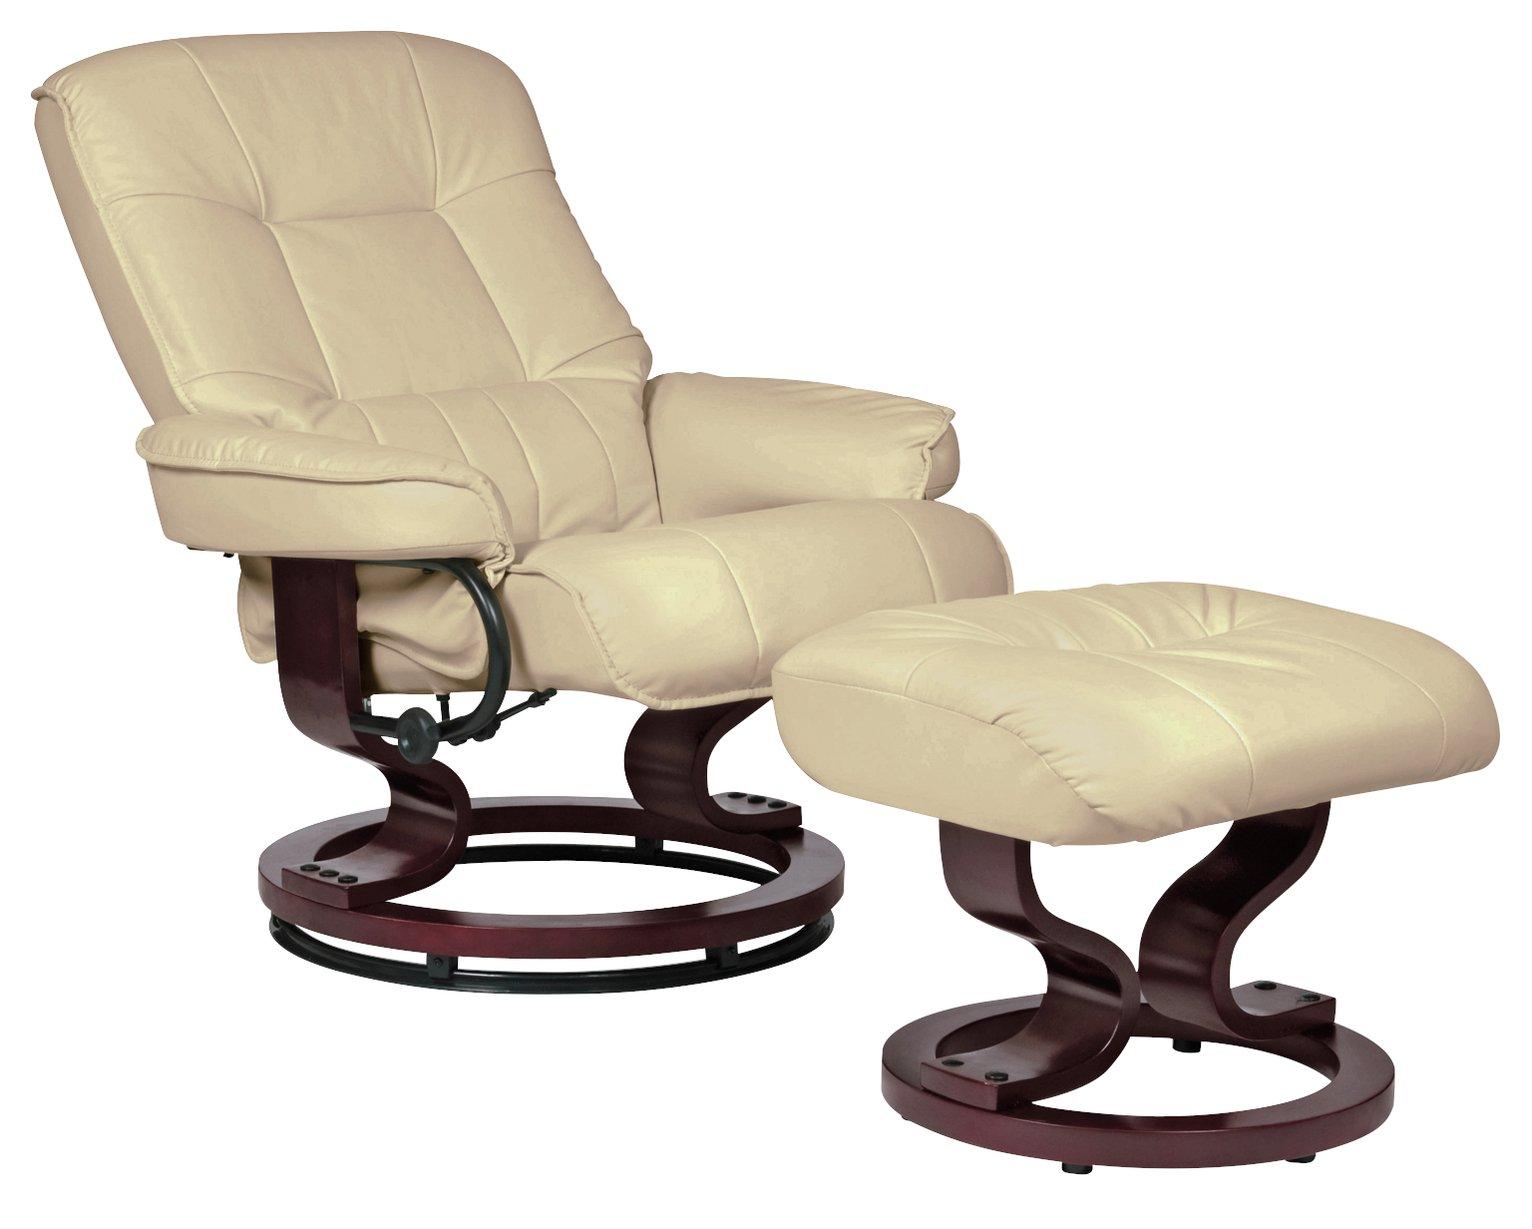 FoxHunter Bonded Leather Massage Cinema Riser Recliner Sofa Power